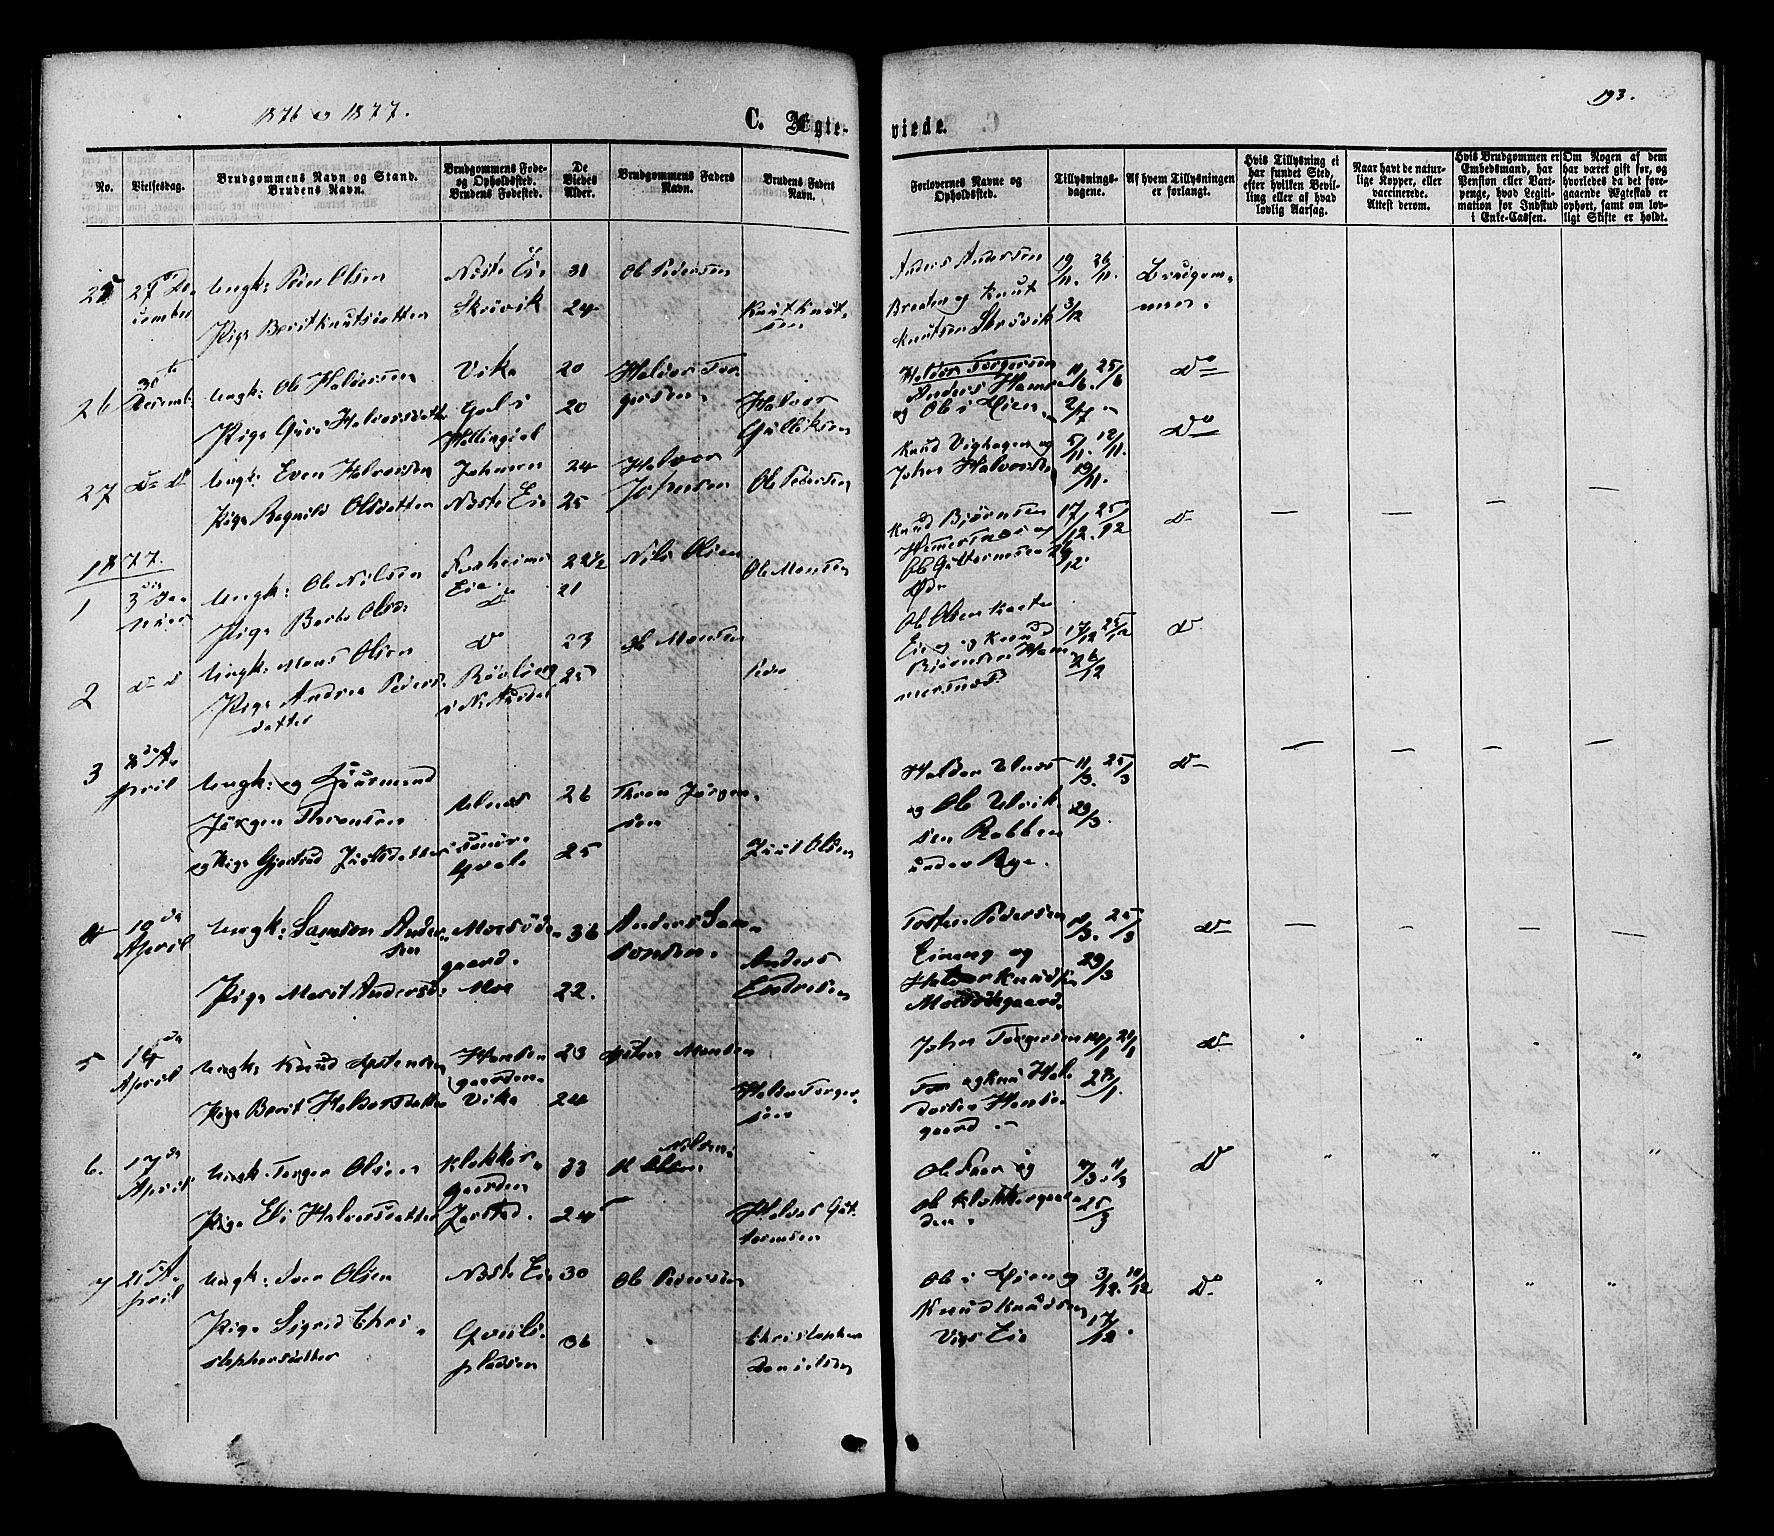 SAH, Vestre Slidre prestekontor, Ministerialbok nr. 3, 1865-1880, s. 193